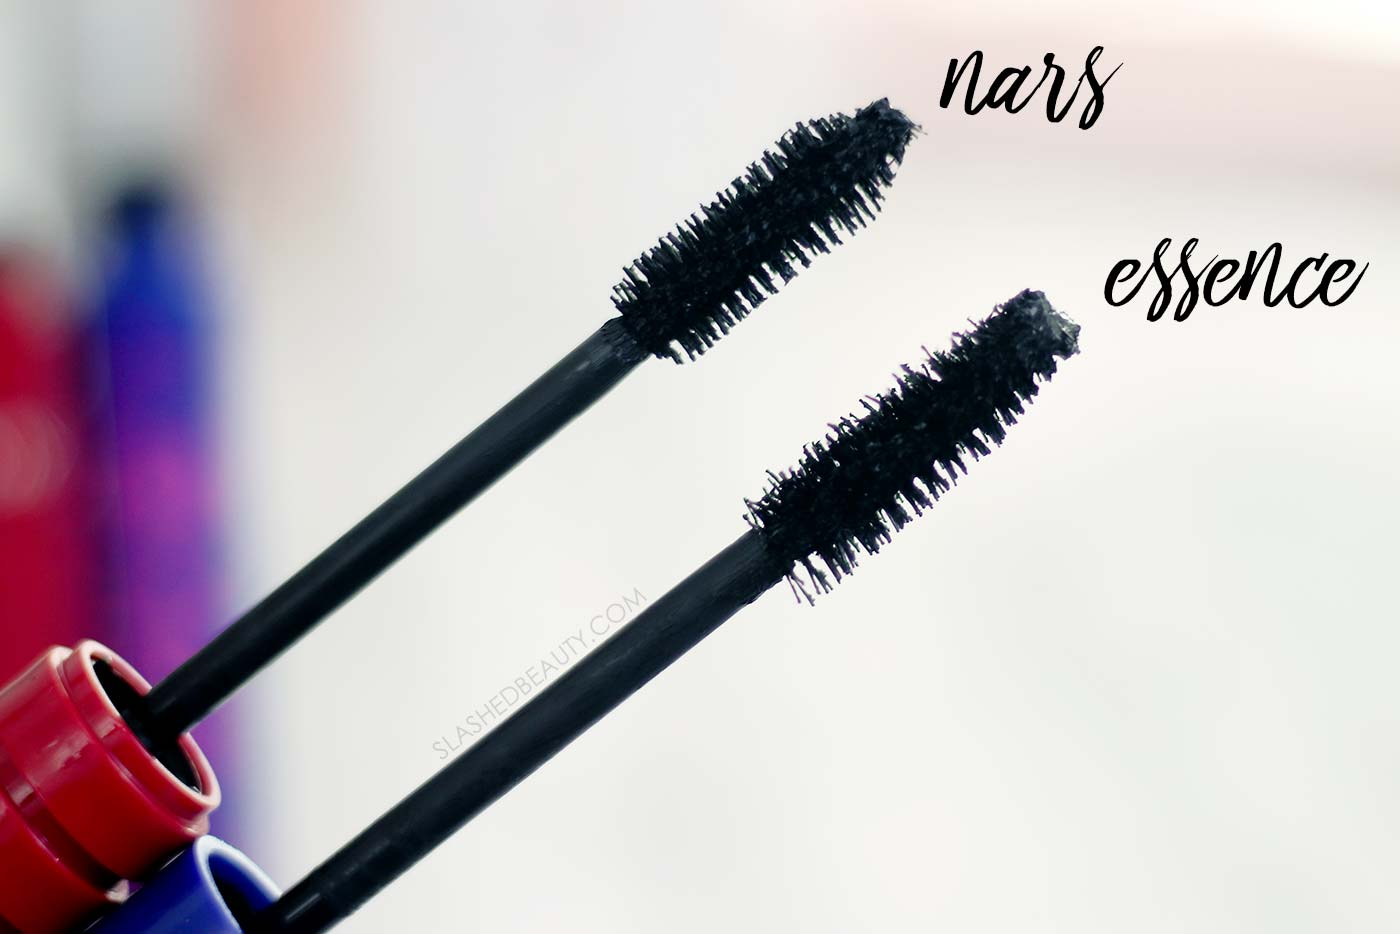 NARS Climax Mascara Brush vs essence I Love Extreme Volume Mascara Brush | NARS Climax Mascara Dupe | Slashed Beauty